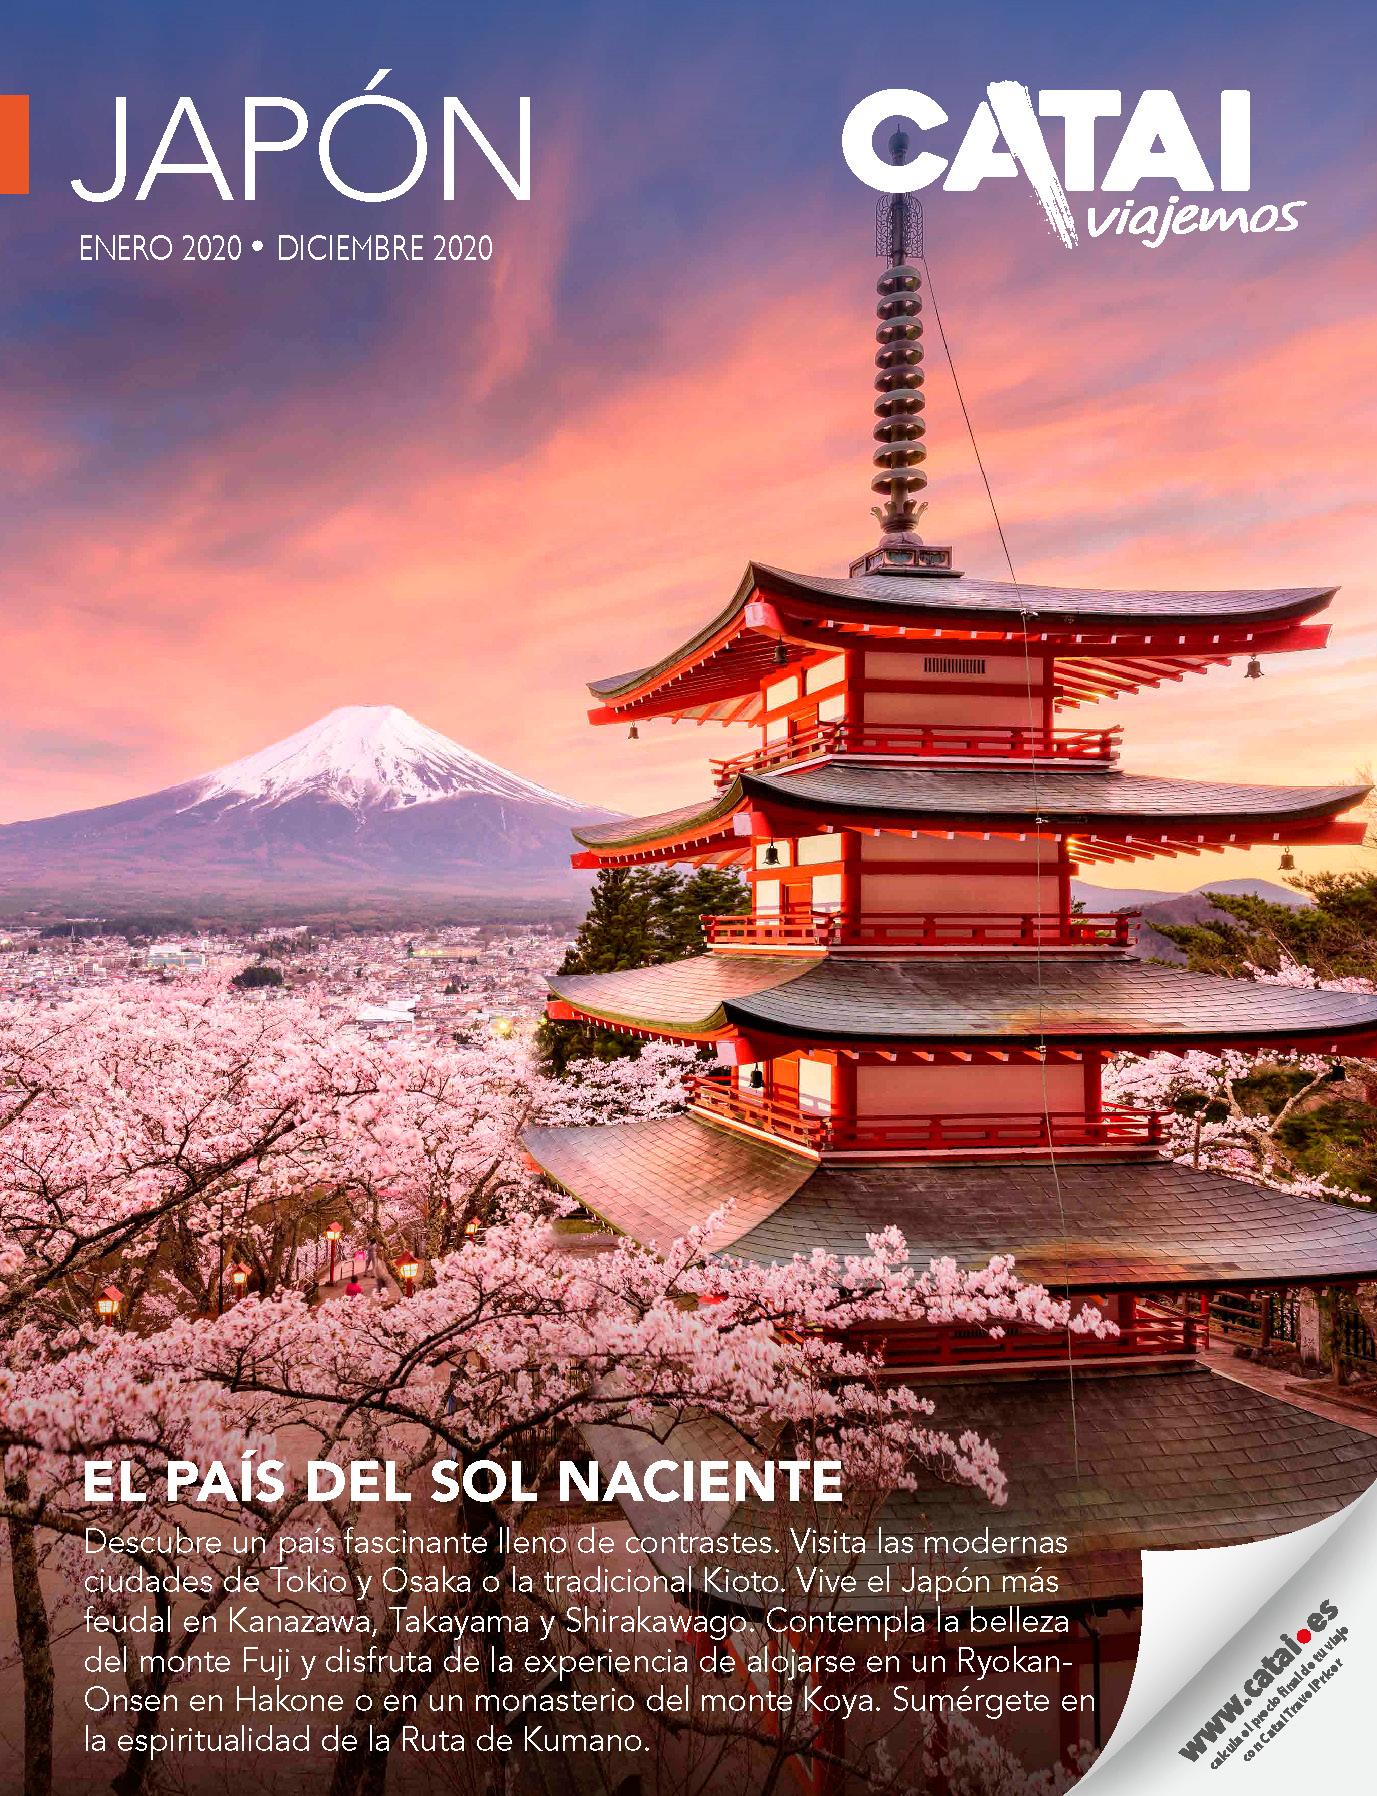 Catalogo Catai Japon 2020